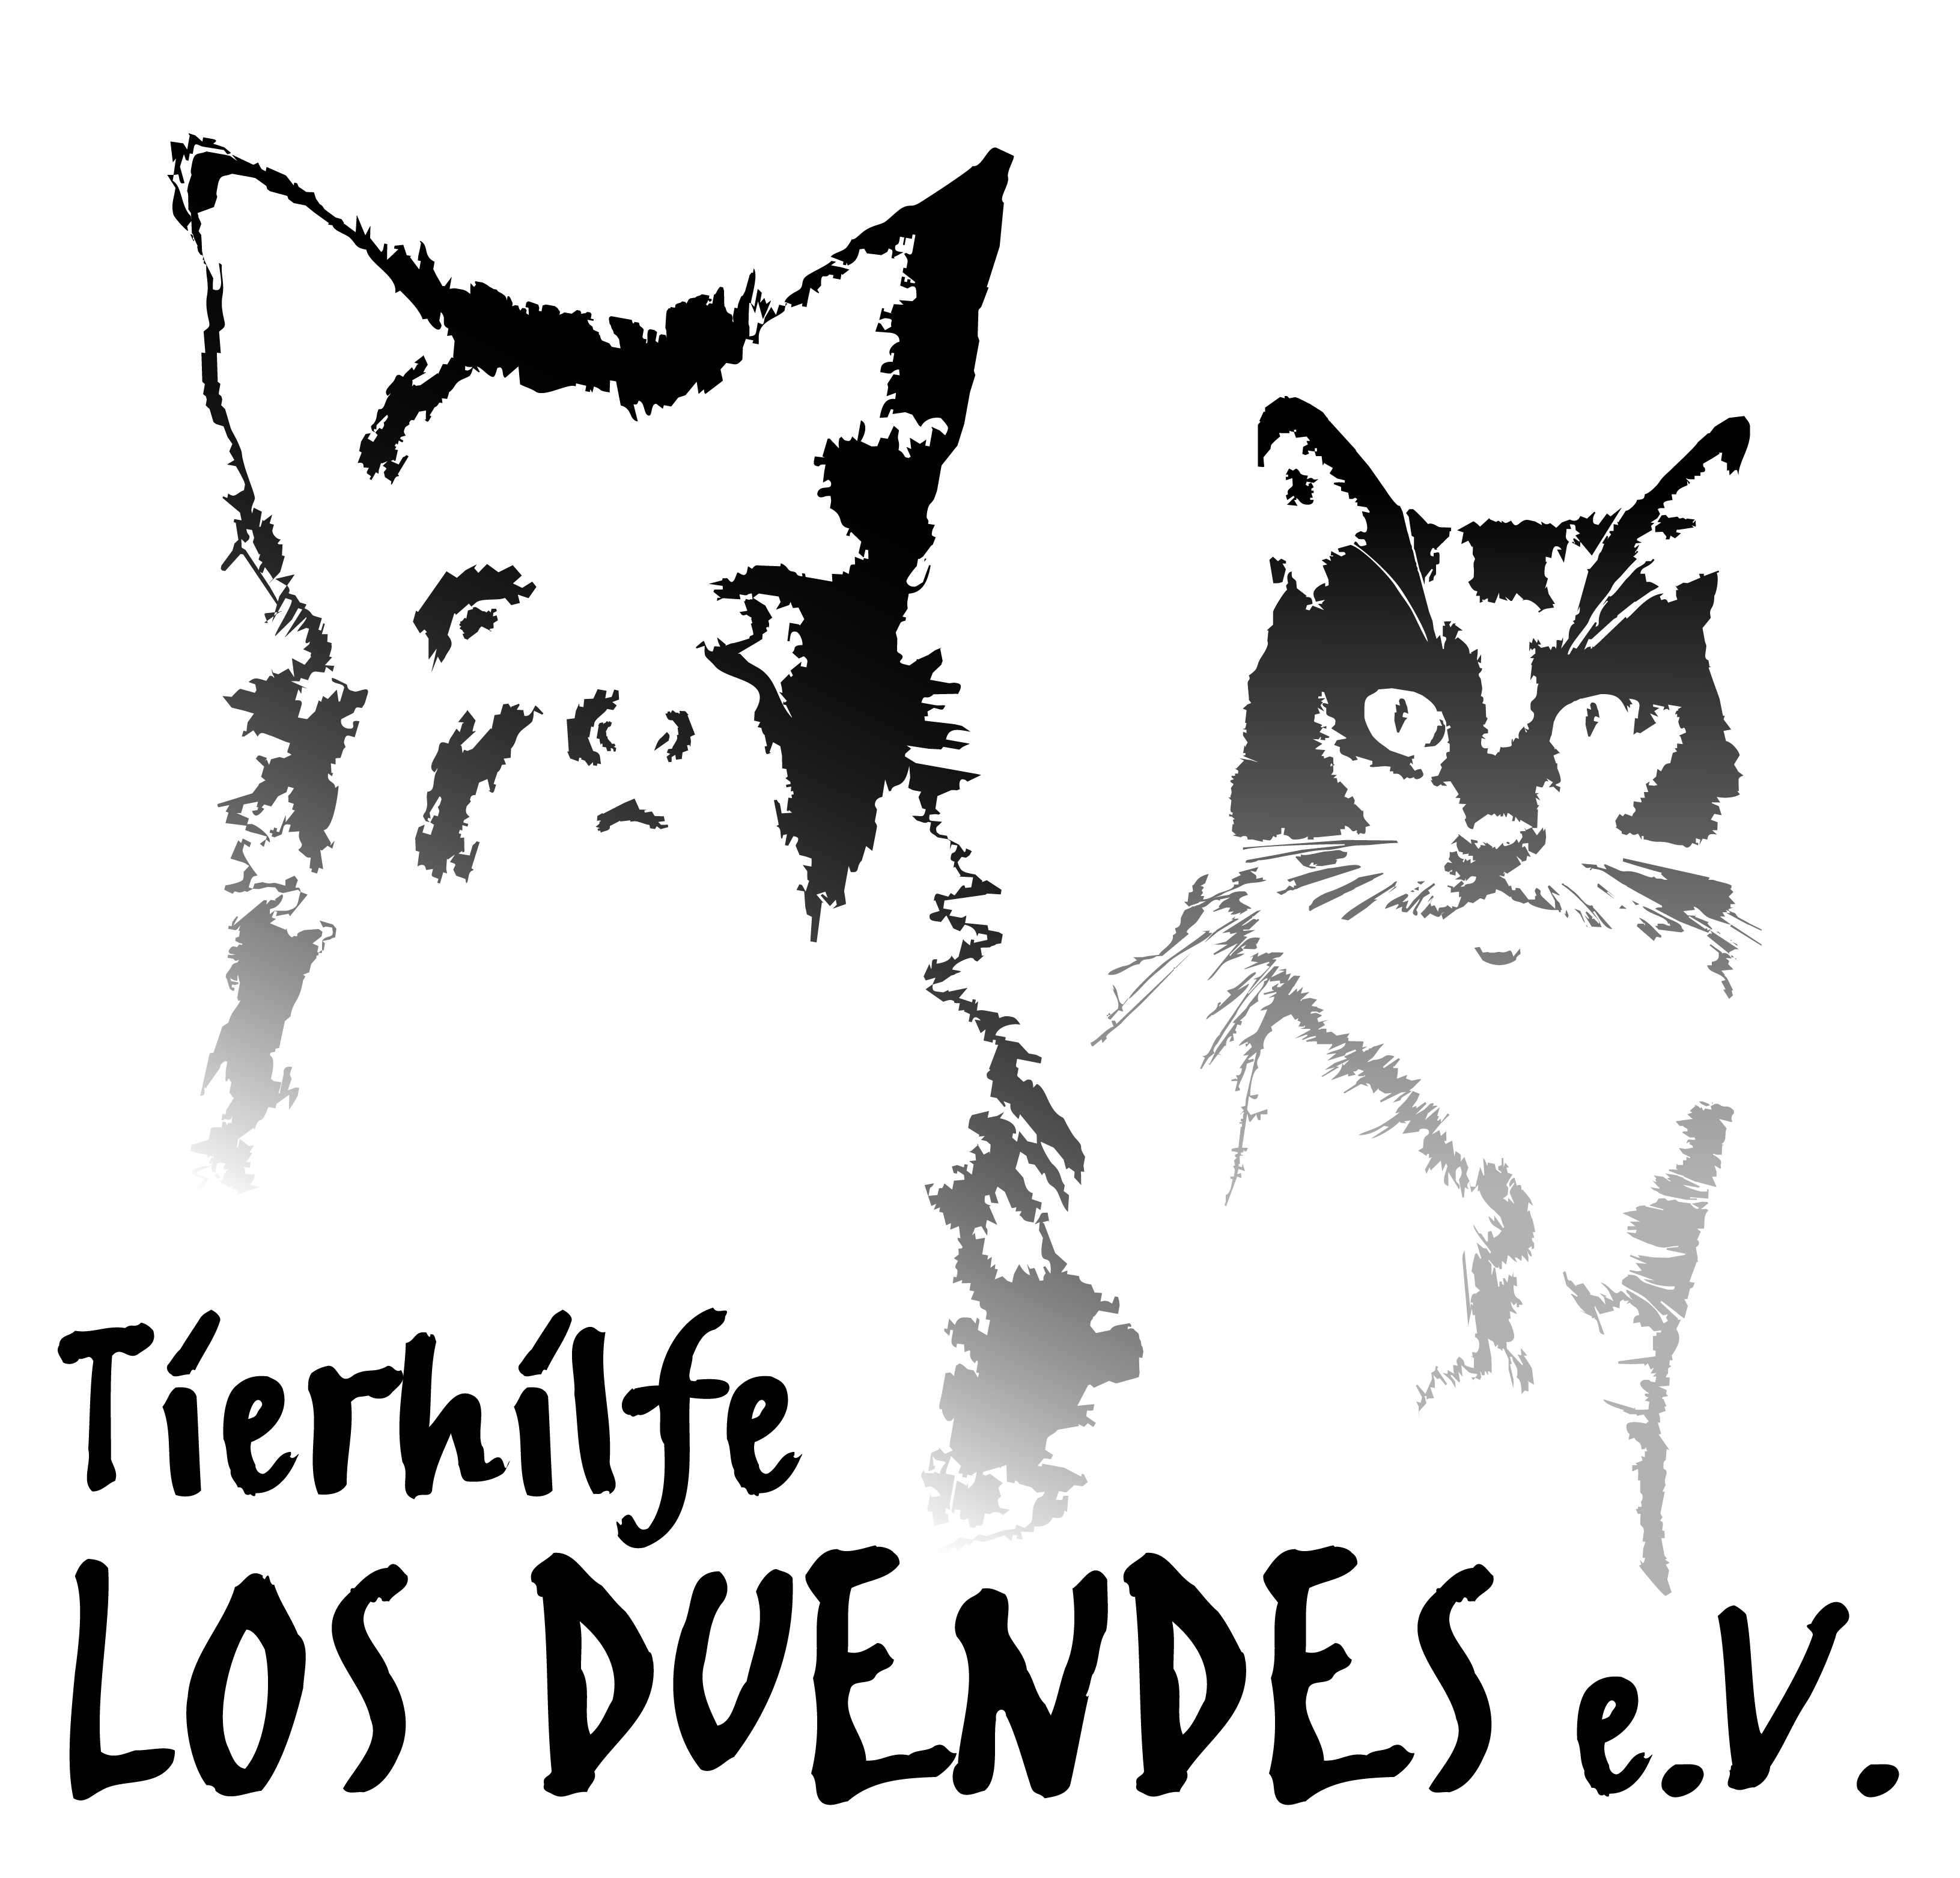 los_duendes_logo_gross.jpg